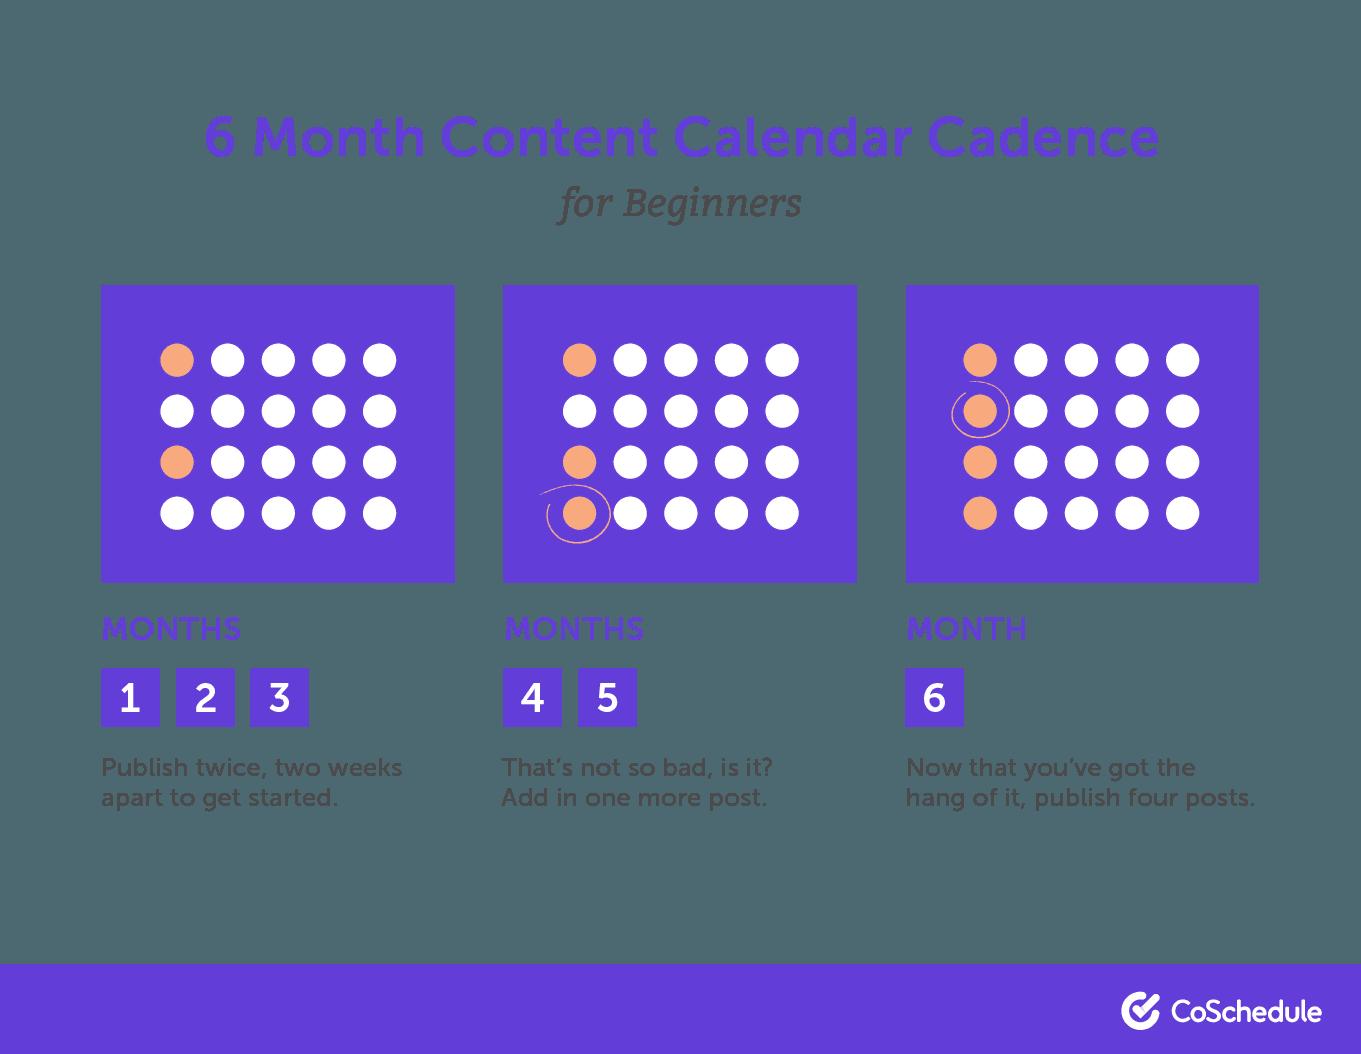 6 month calendar cadence for beginners